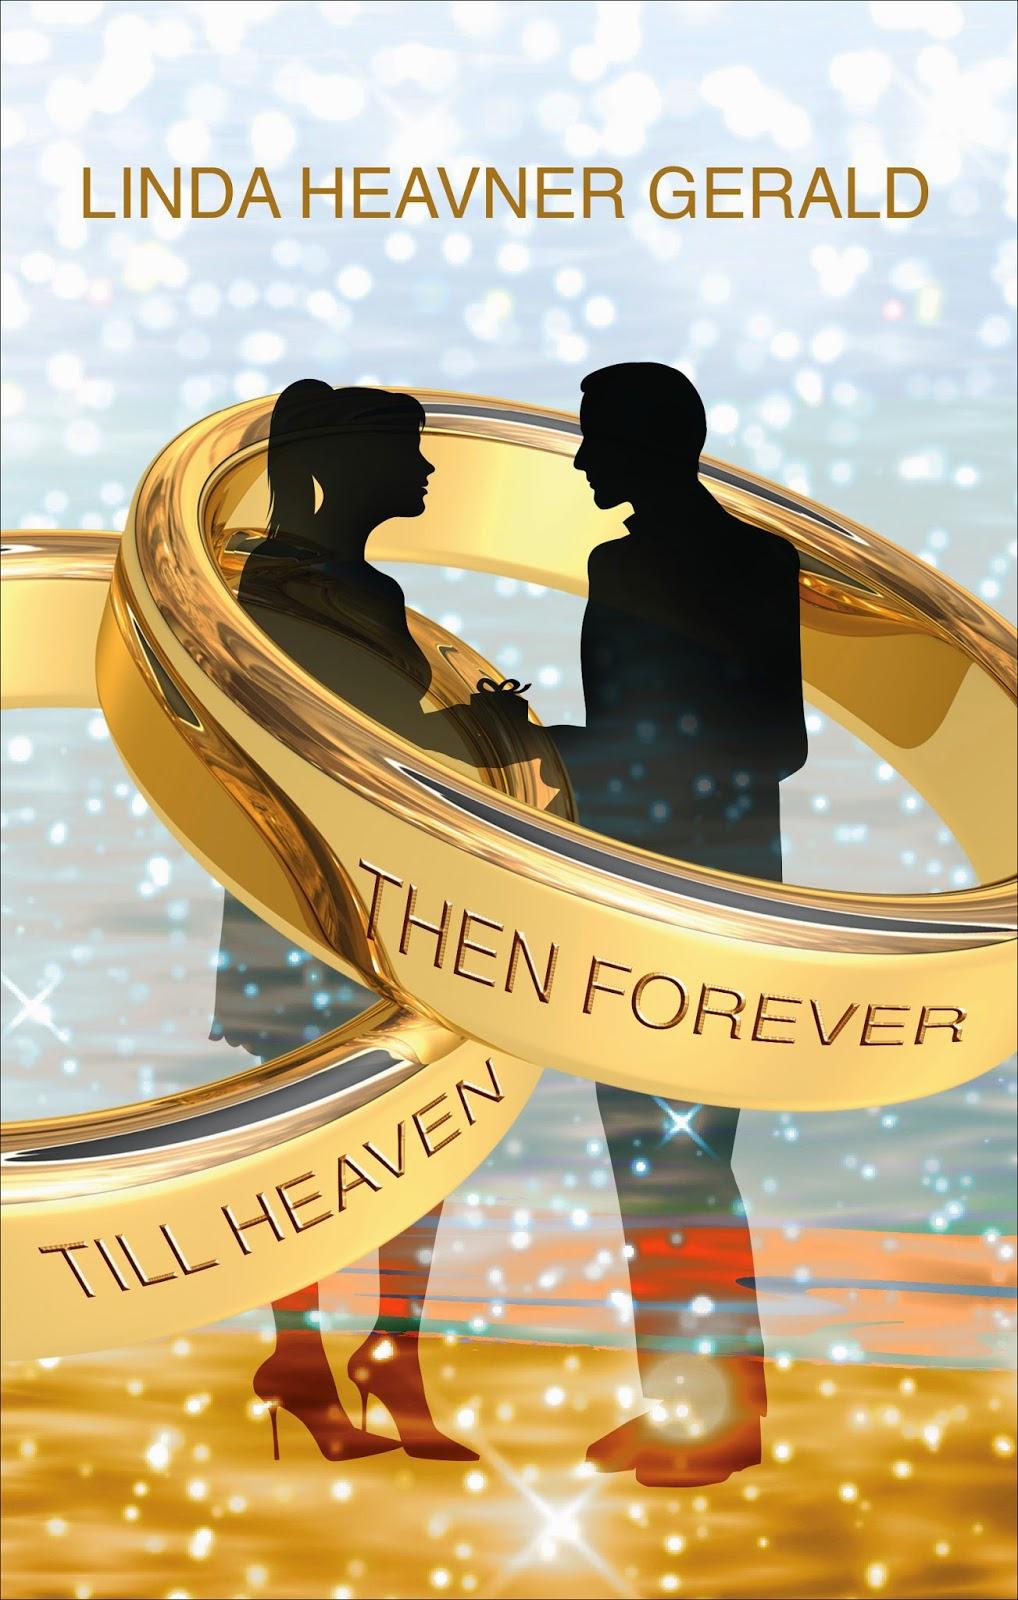 http://www.amazon.com/Heaven-Forever-Linda-Heavner-Gerald-ebook/dp/B00IZLR75M/ref=la_B00B6SPNPM_1_1?s=books&ie=UTF8&qid=1412369164&sr=1-1